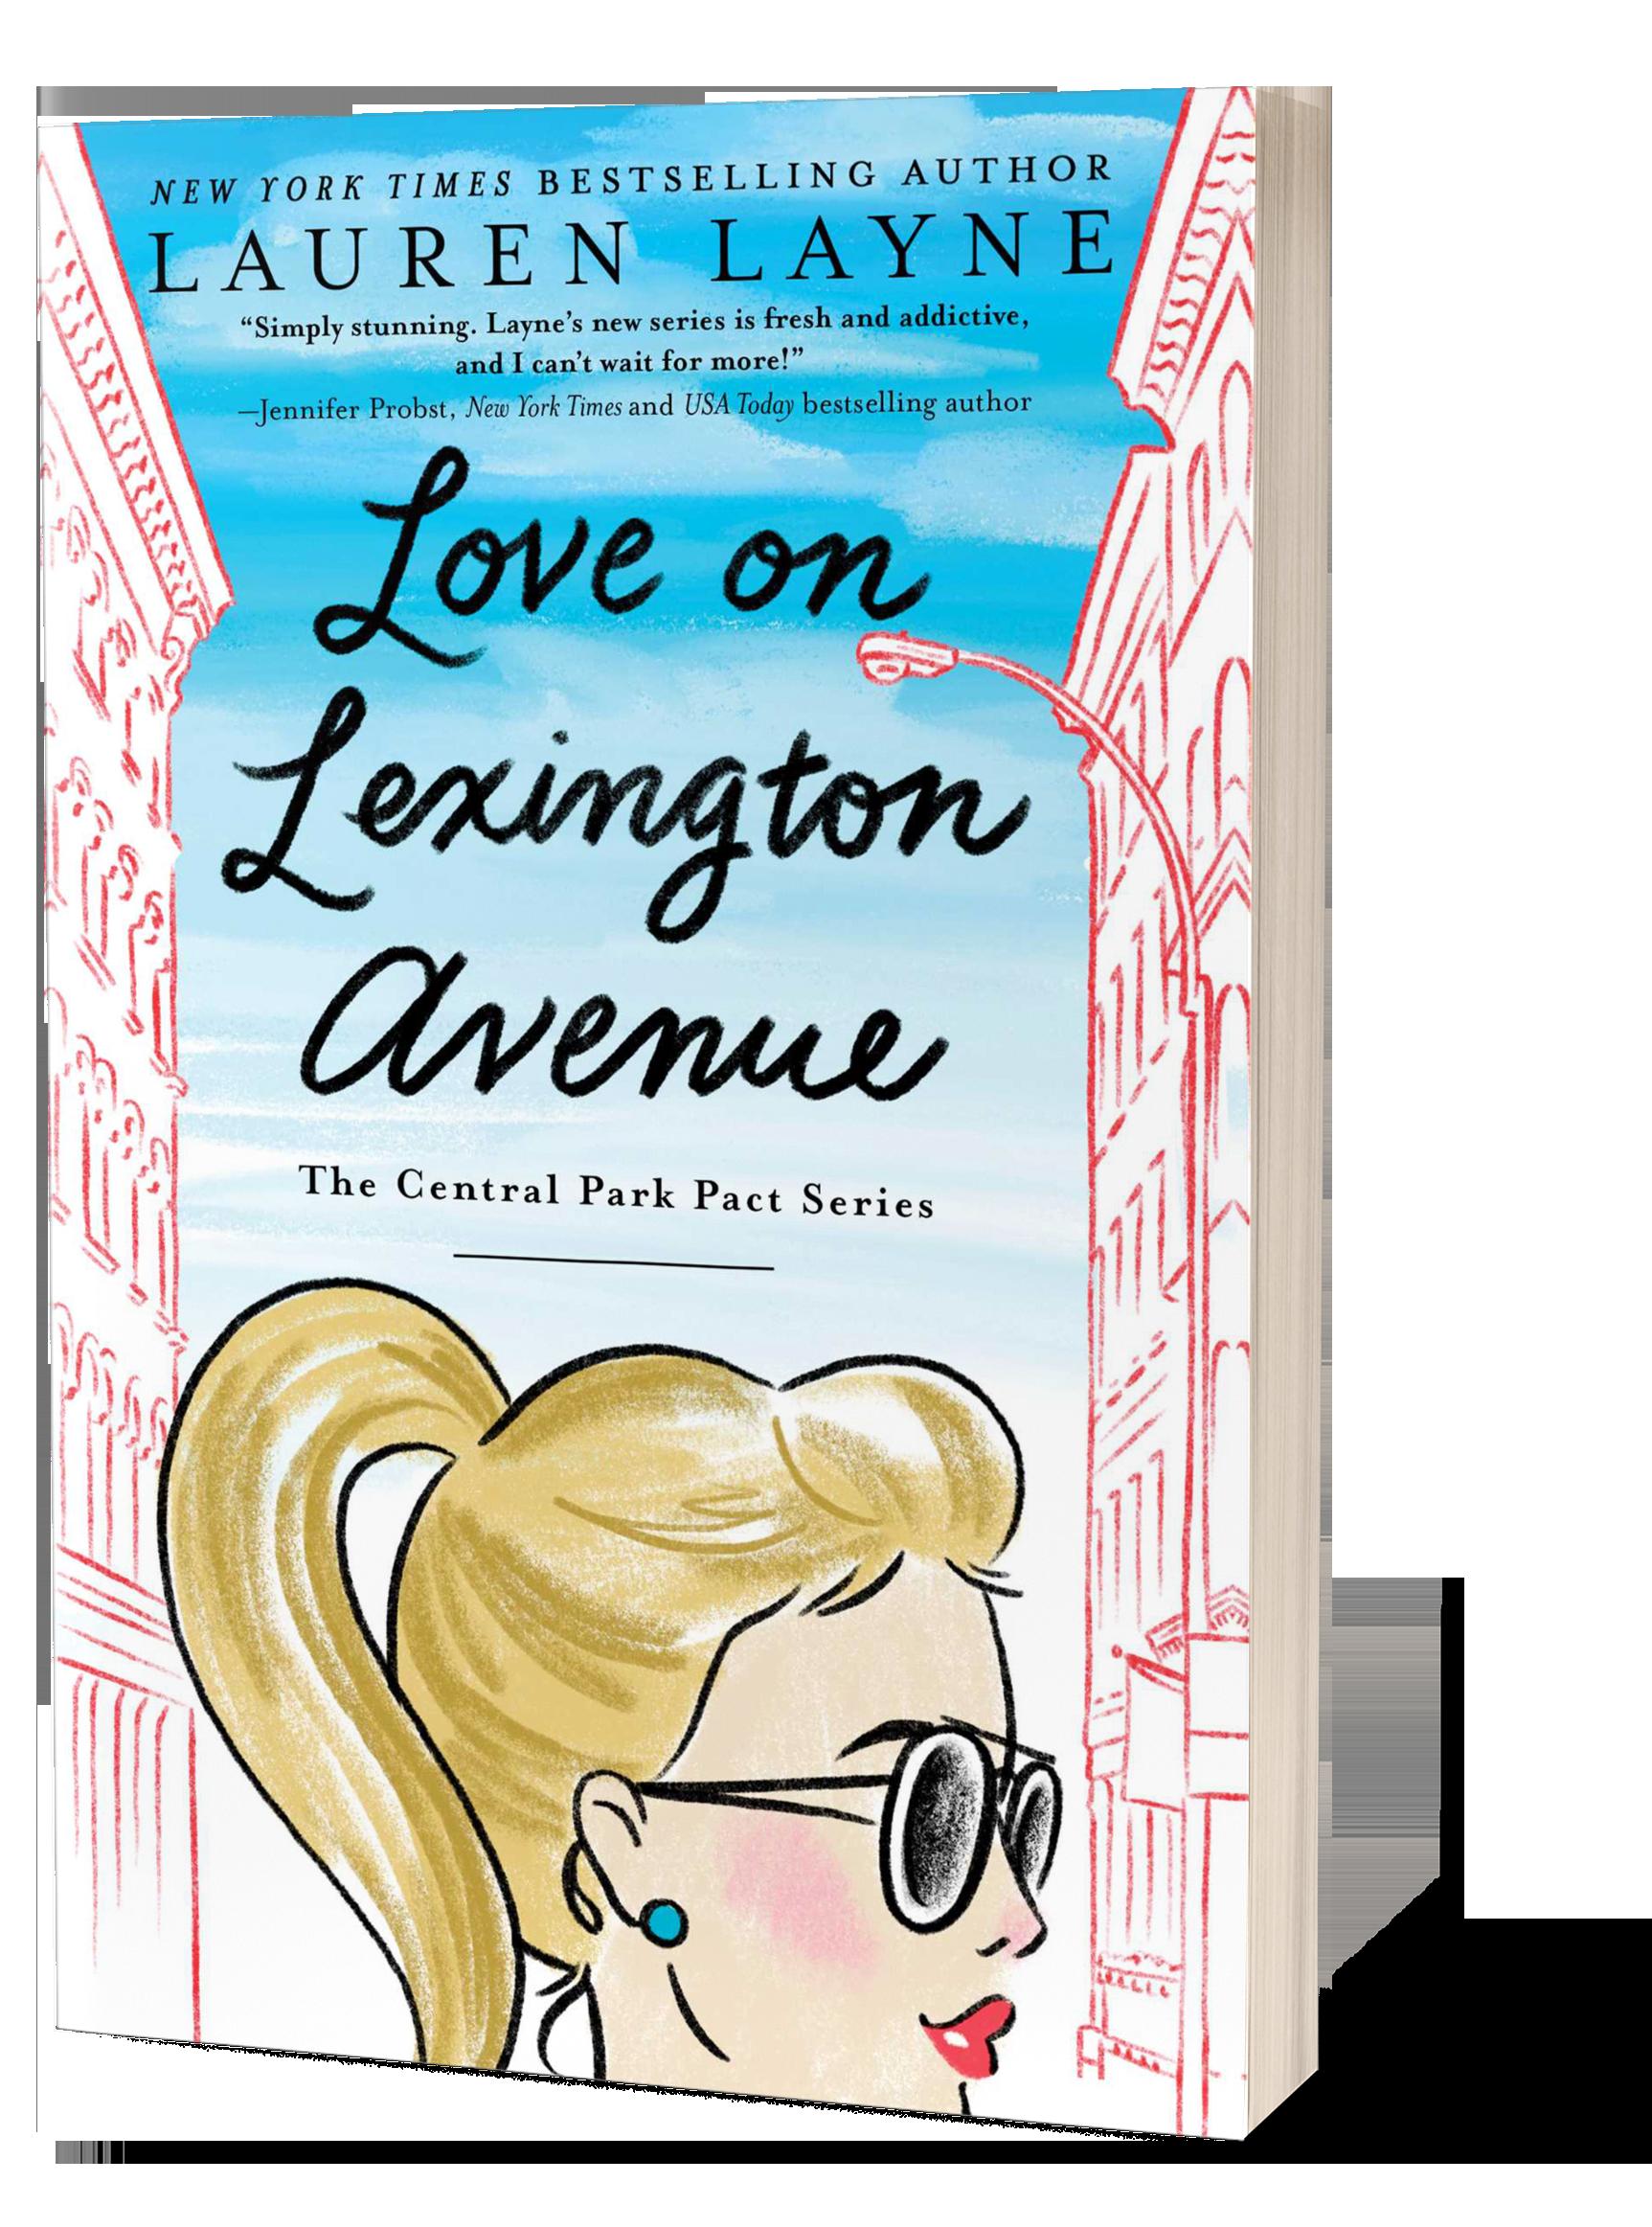 LoveOnLexingtonAvenue(Quote)_Print.png